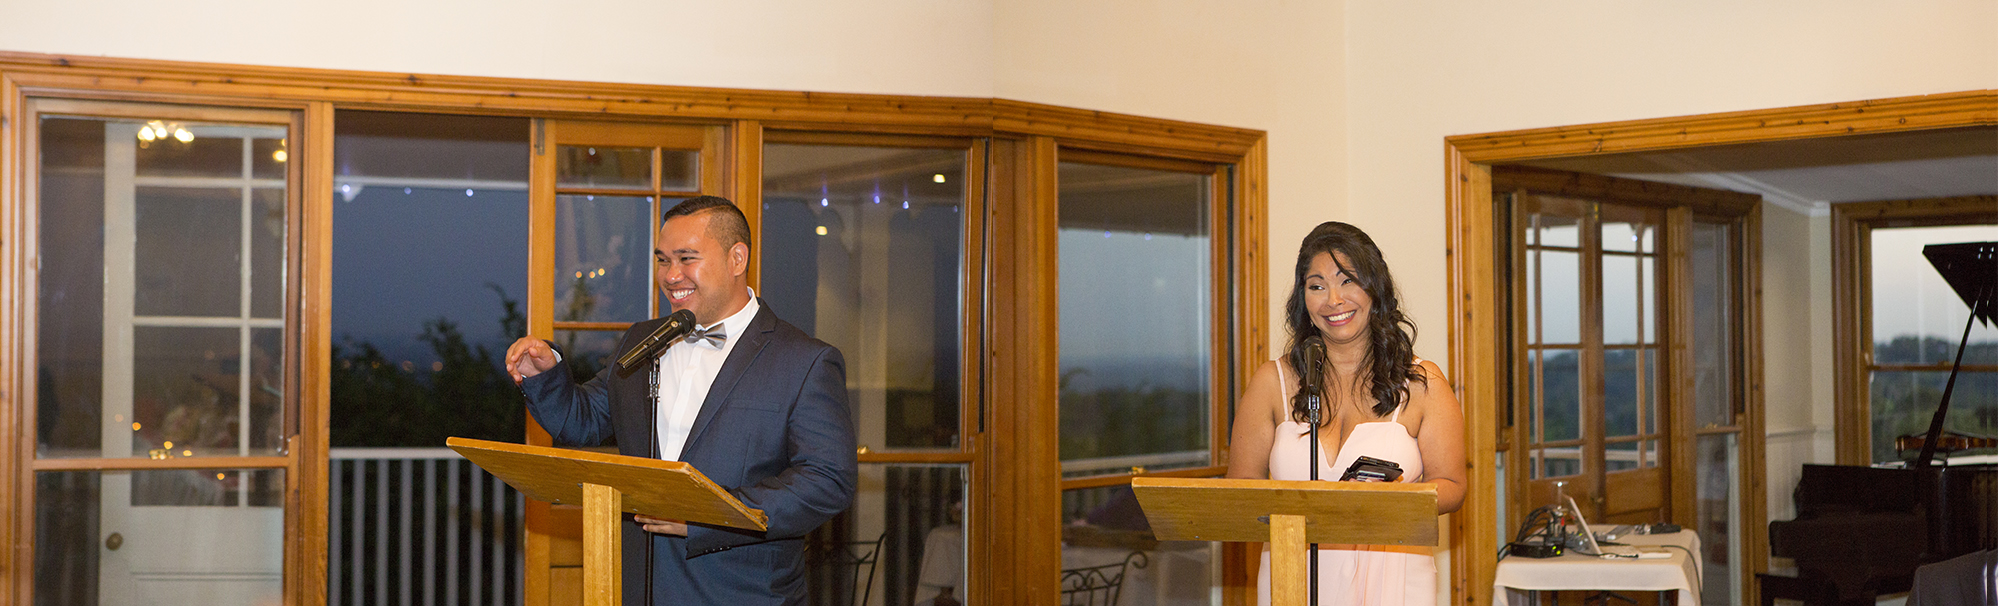 Sydney Wedding Photographer - Jennifer Lam Photography - www.jenniferlamphotography (89).jpg